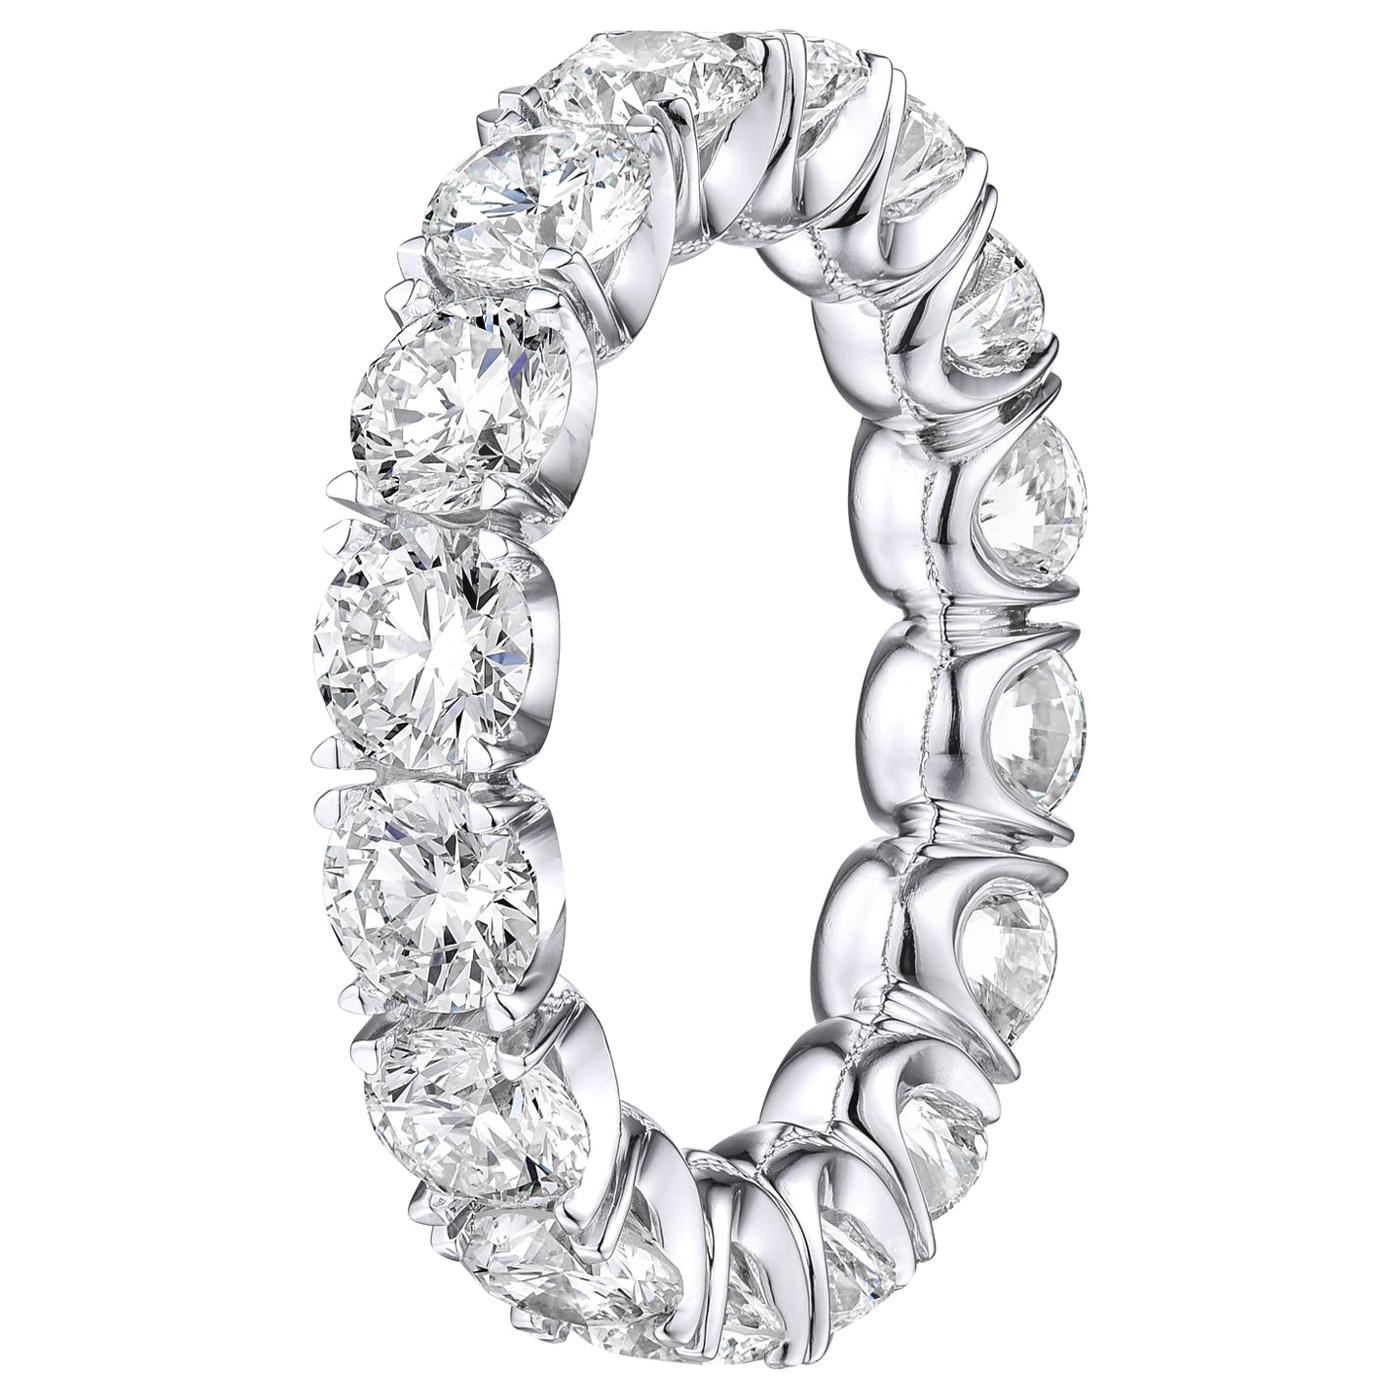 Brilliant Round 4.45 Carat Diamond Wedding Eternity Band Set in Platinum